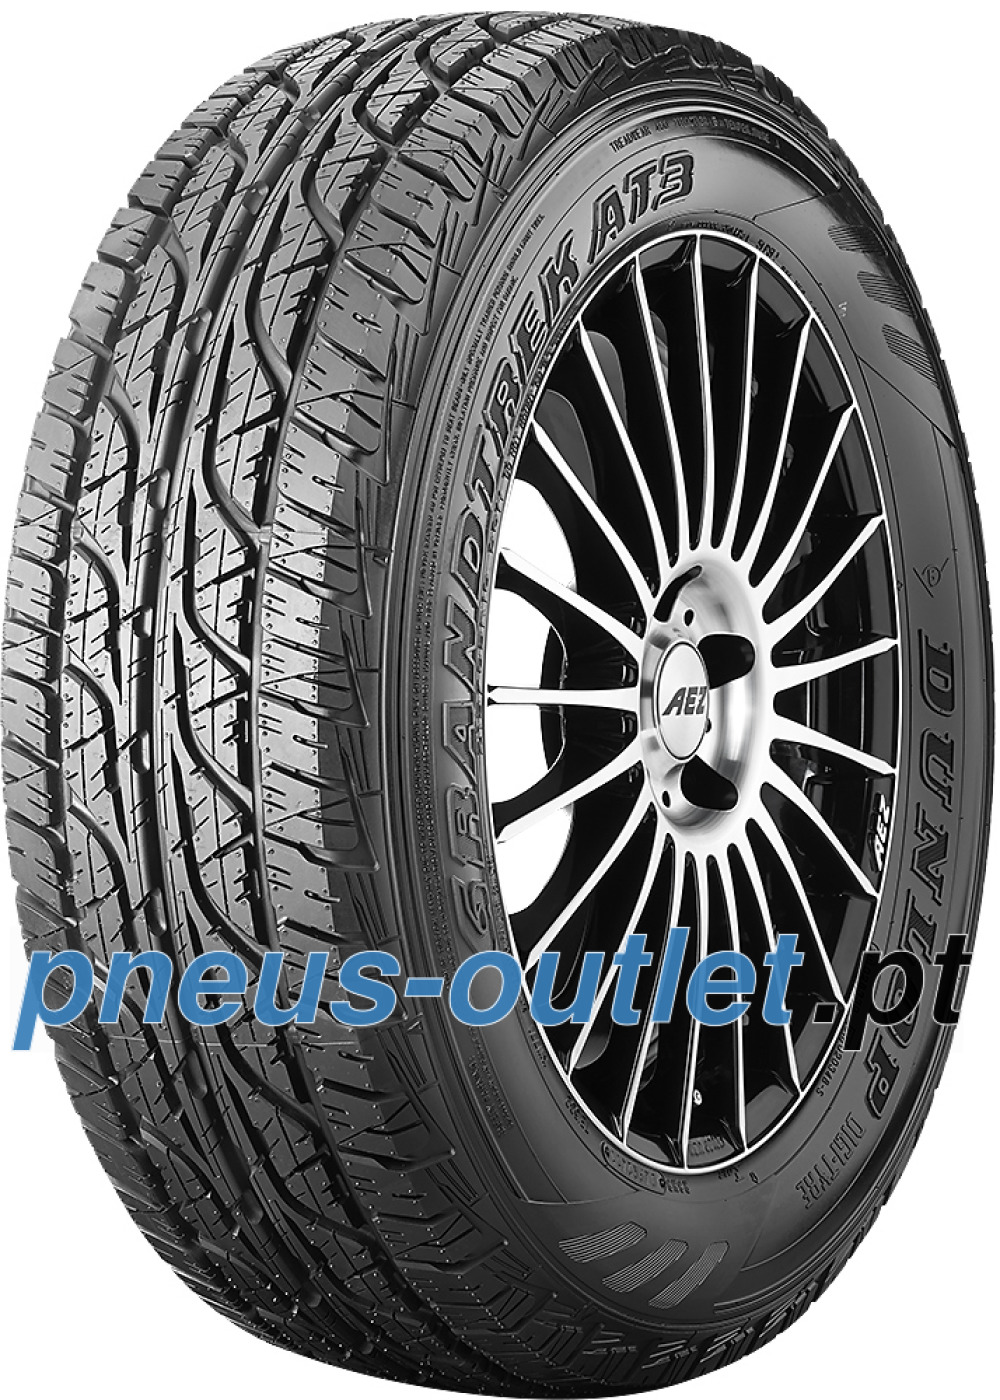 Dunlop Grandtrek AT 3 ( 265/70 R16 112T OWL )